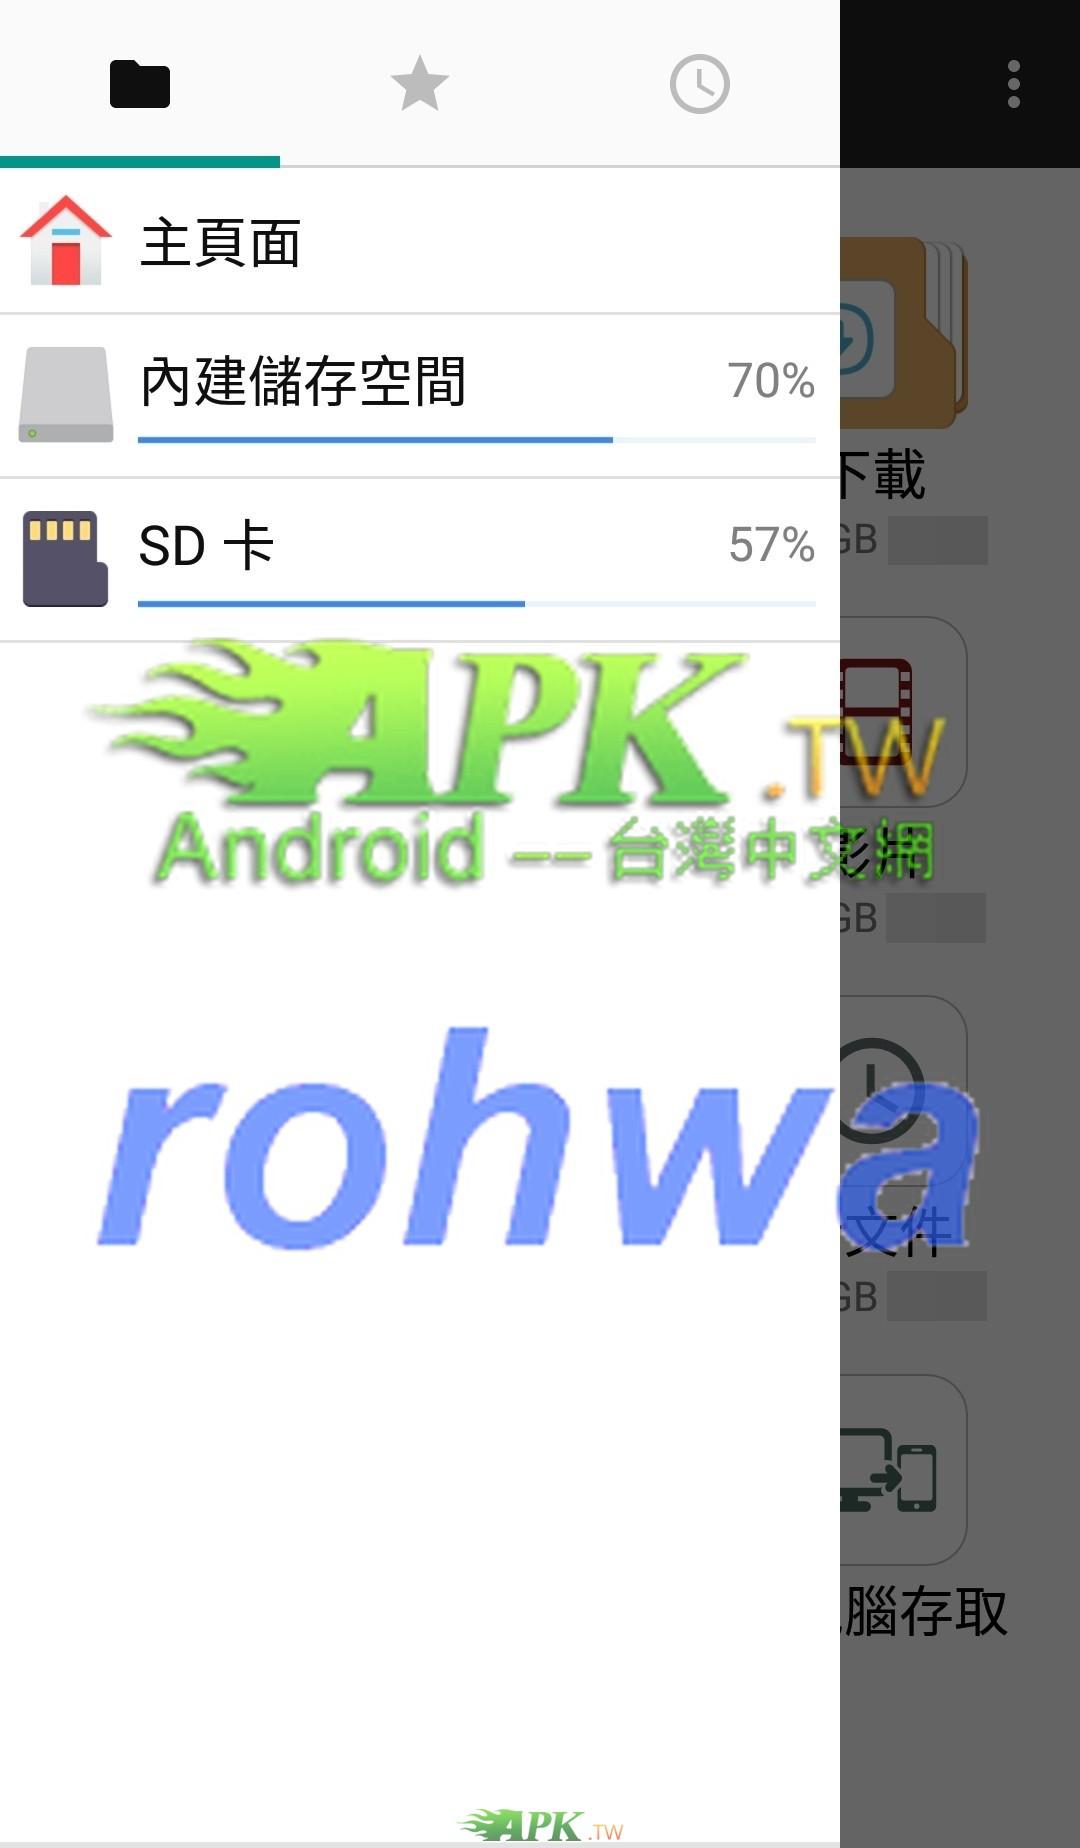 FileManager__2_.jpg